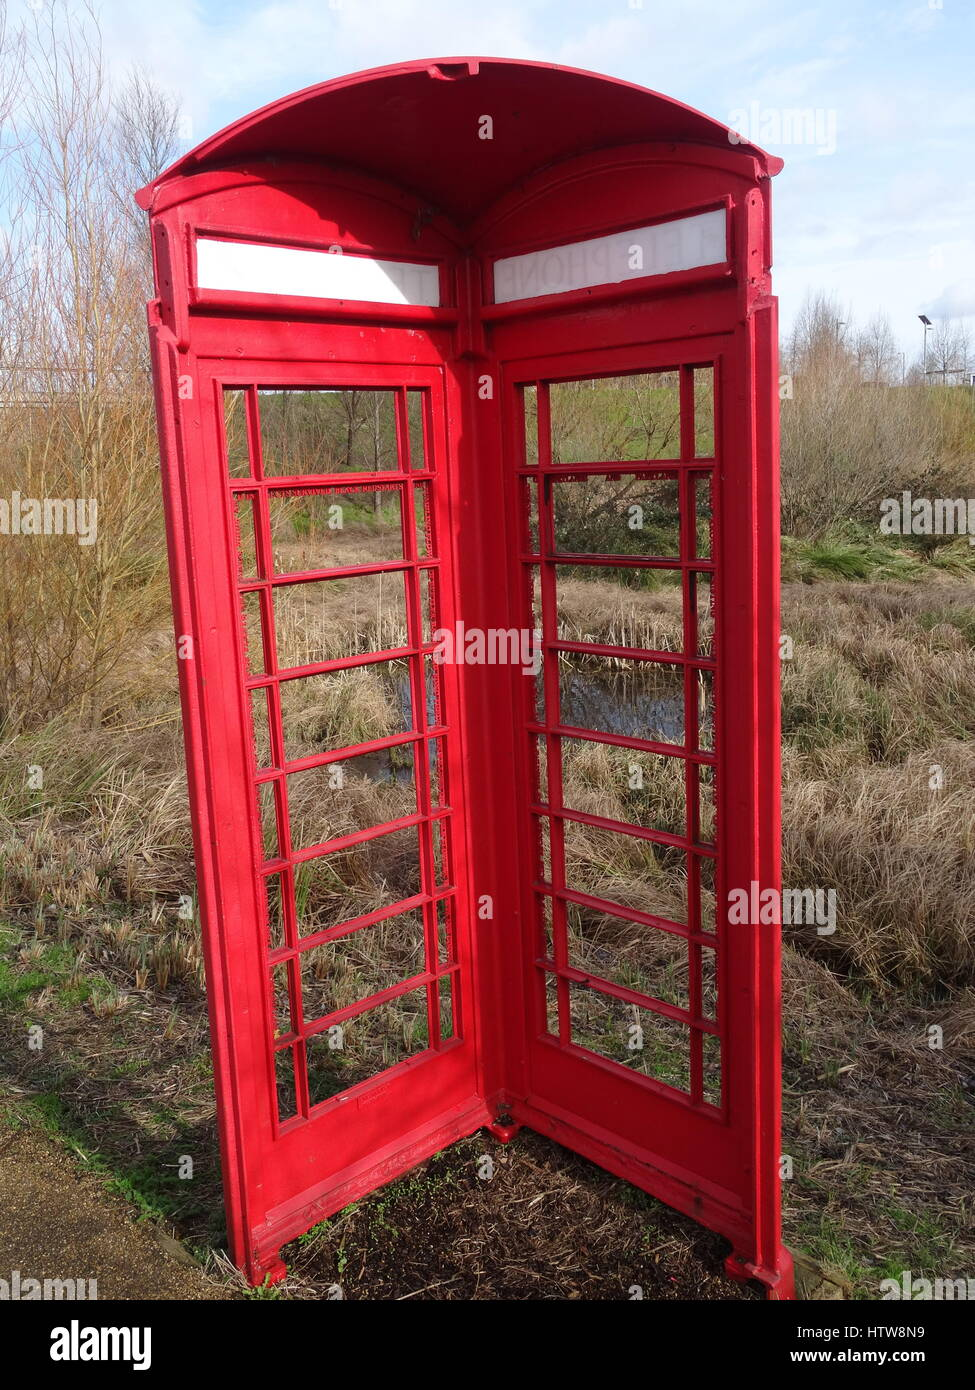 Stratford phone box - Stock Image